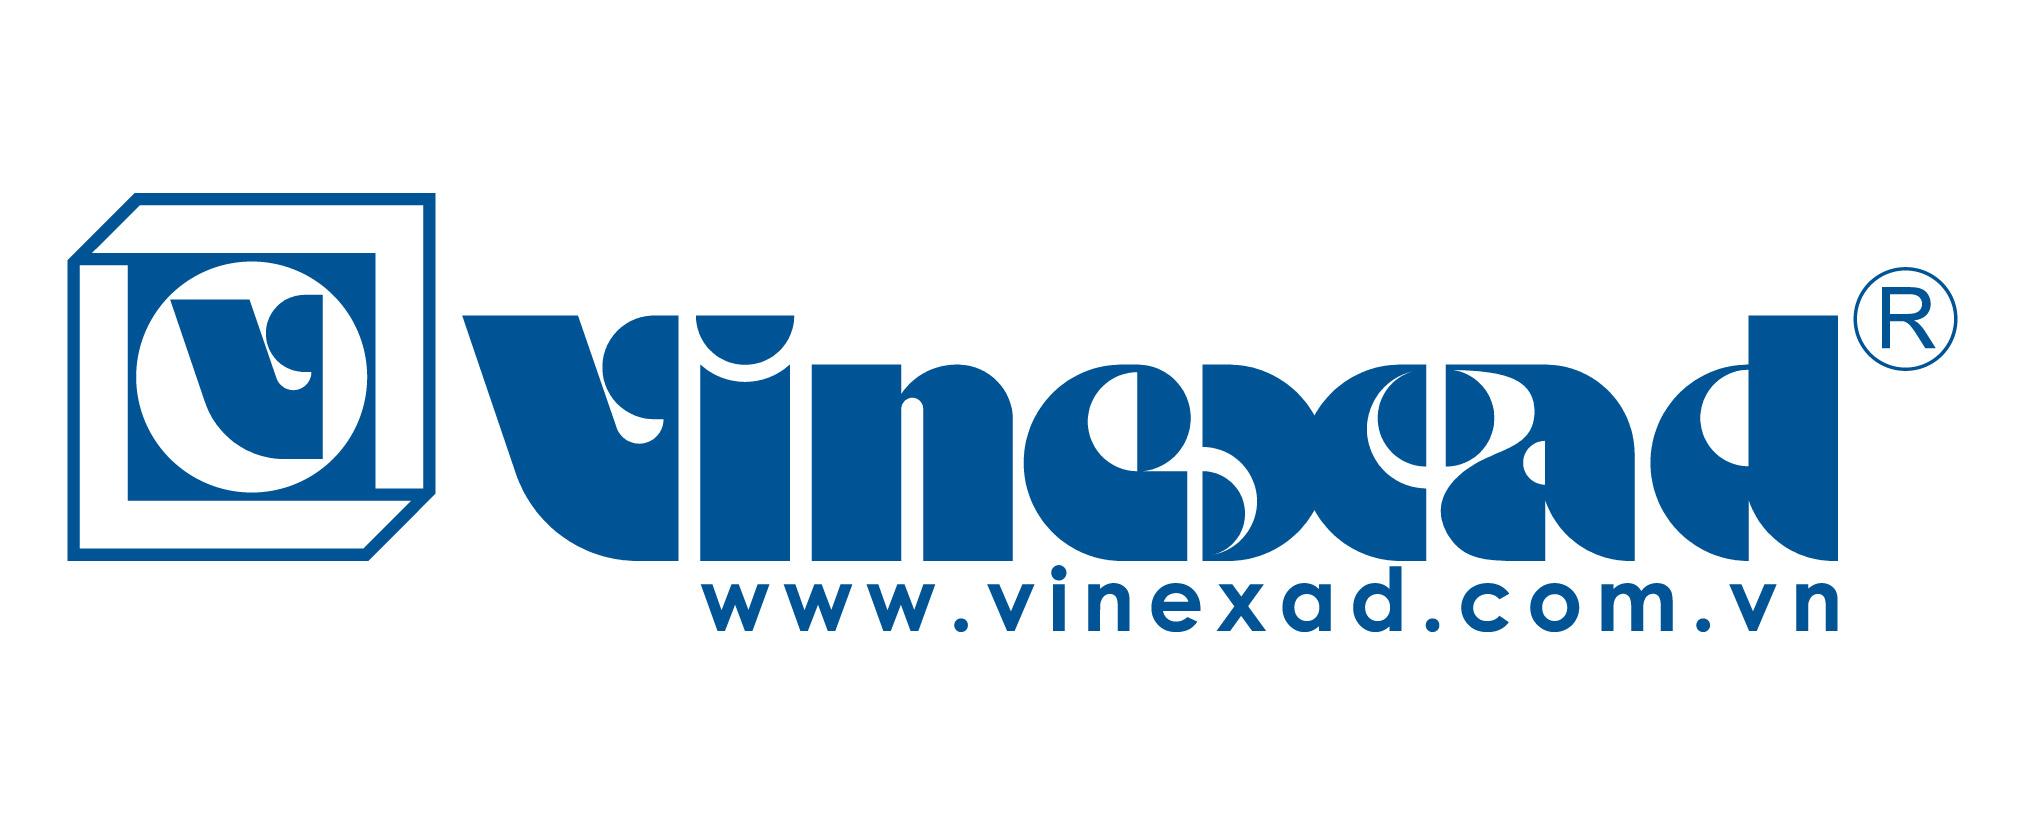 Vinexad